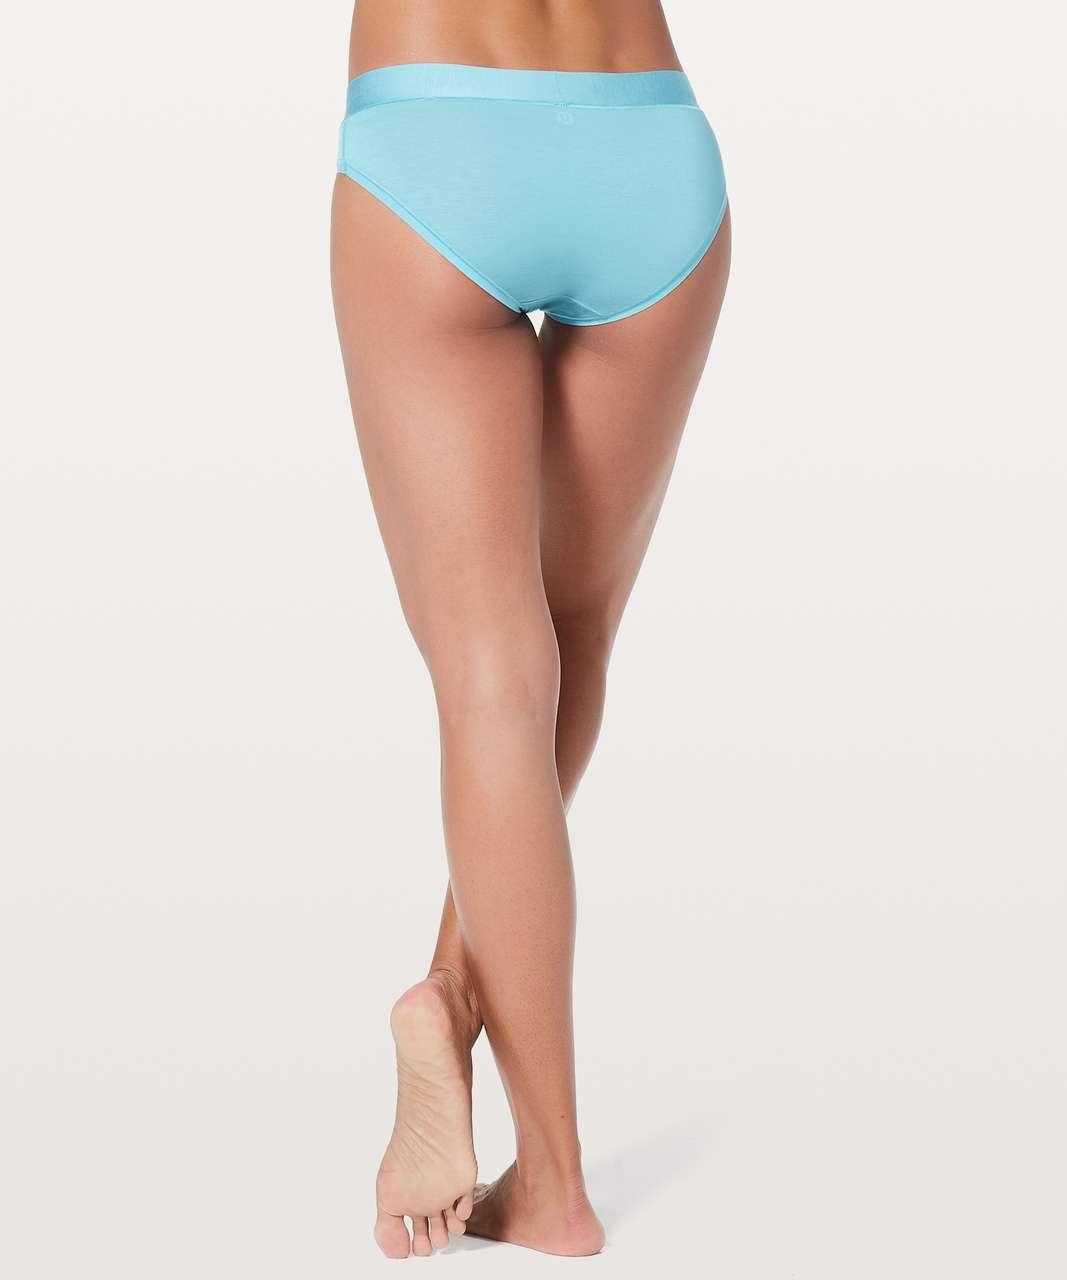 Lululemon Mula Bandhawear Bikini - Eton Blue